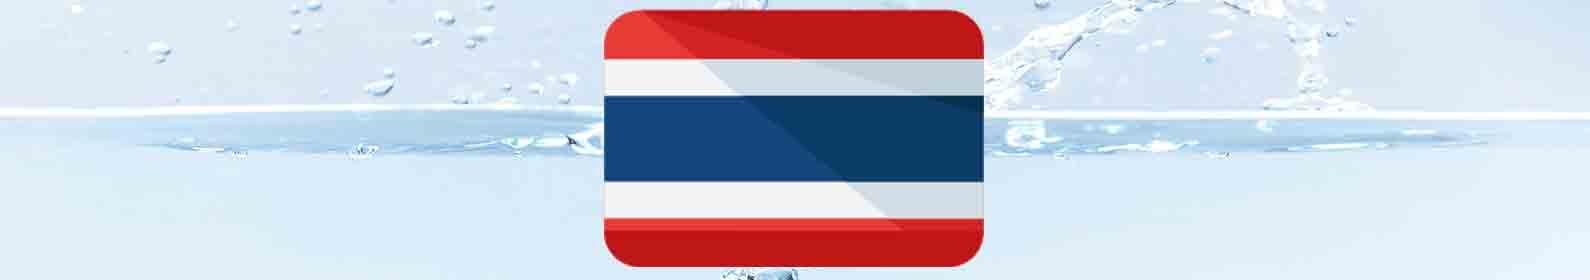 water-treatment-thailand.jpg